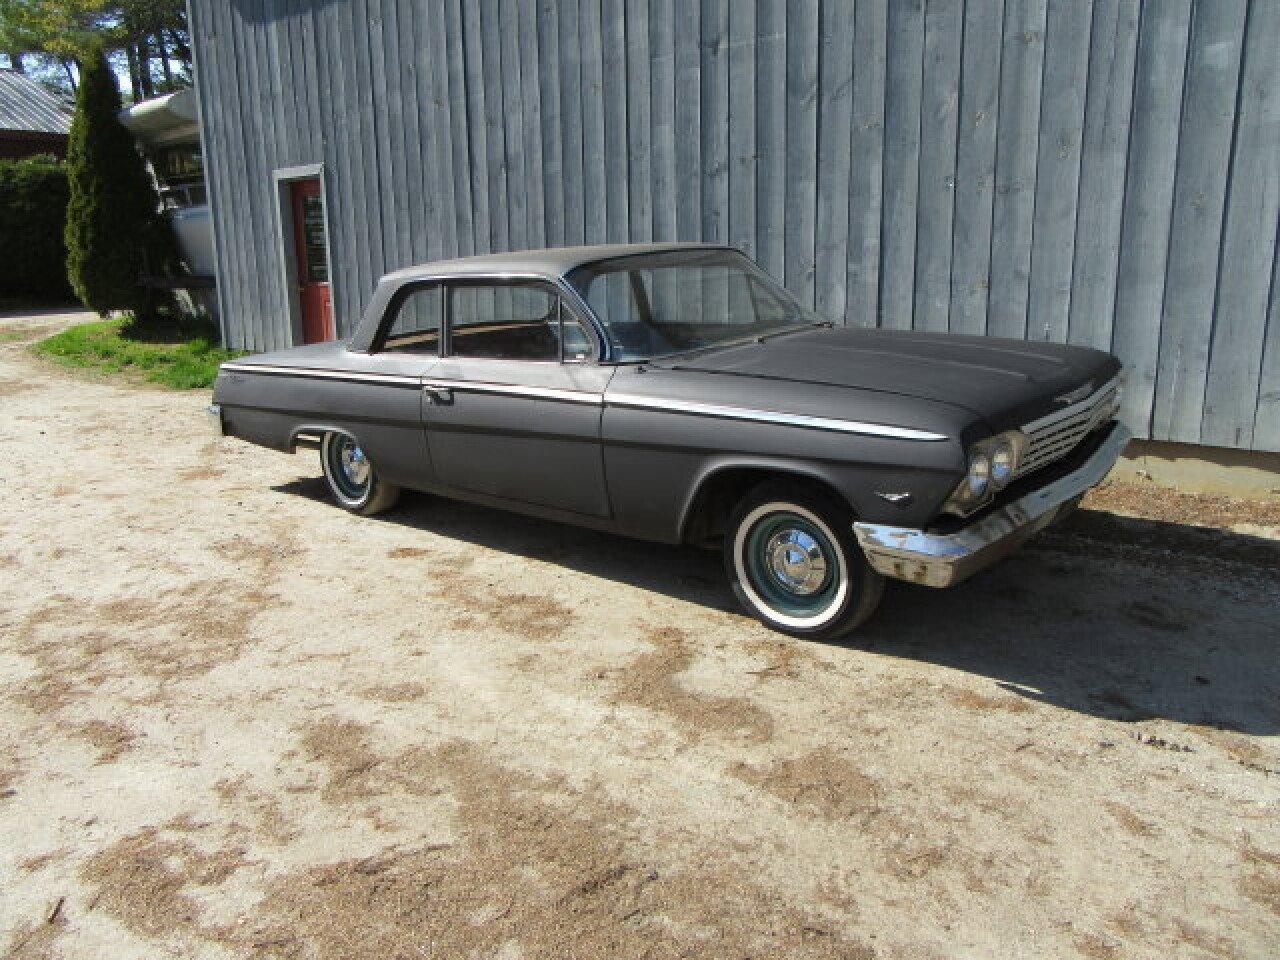 1962 Chevrolet Bel Air For Sale Near Freeport, Maine 04032